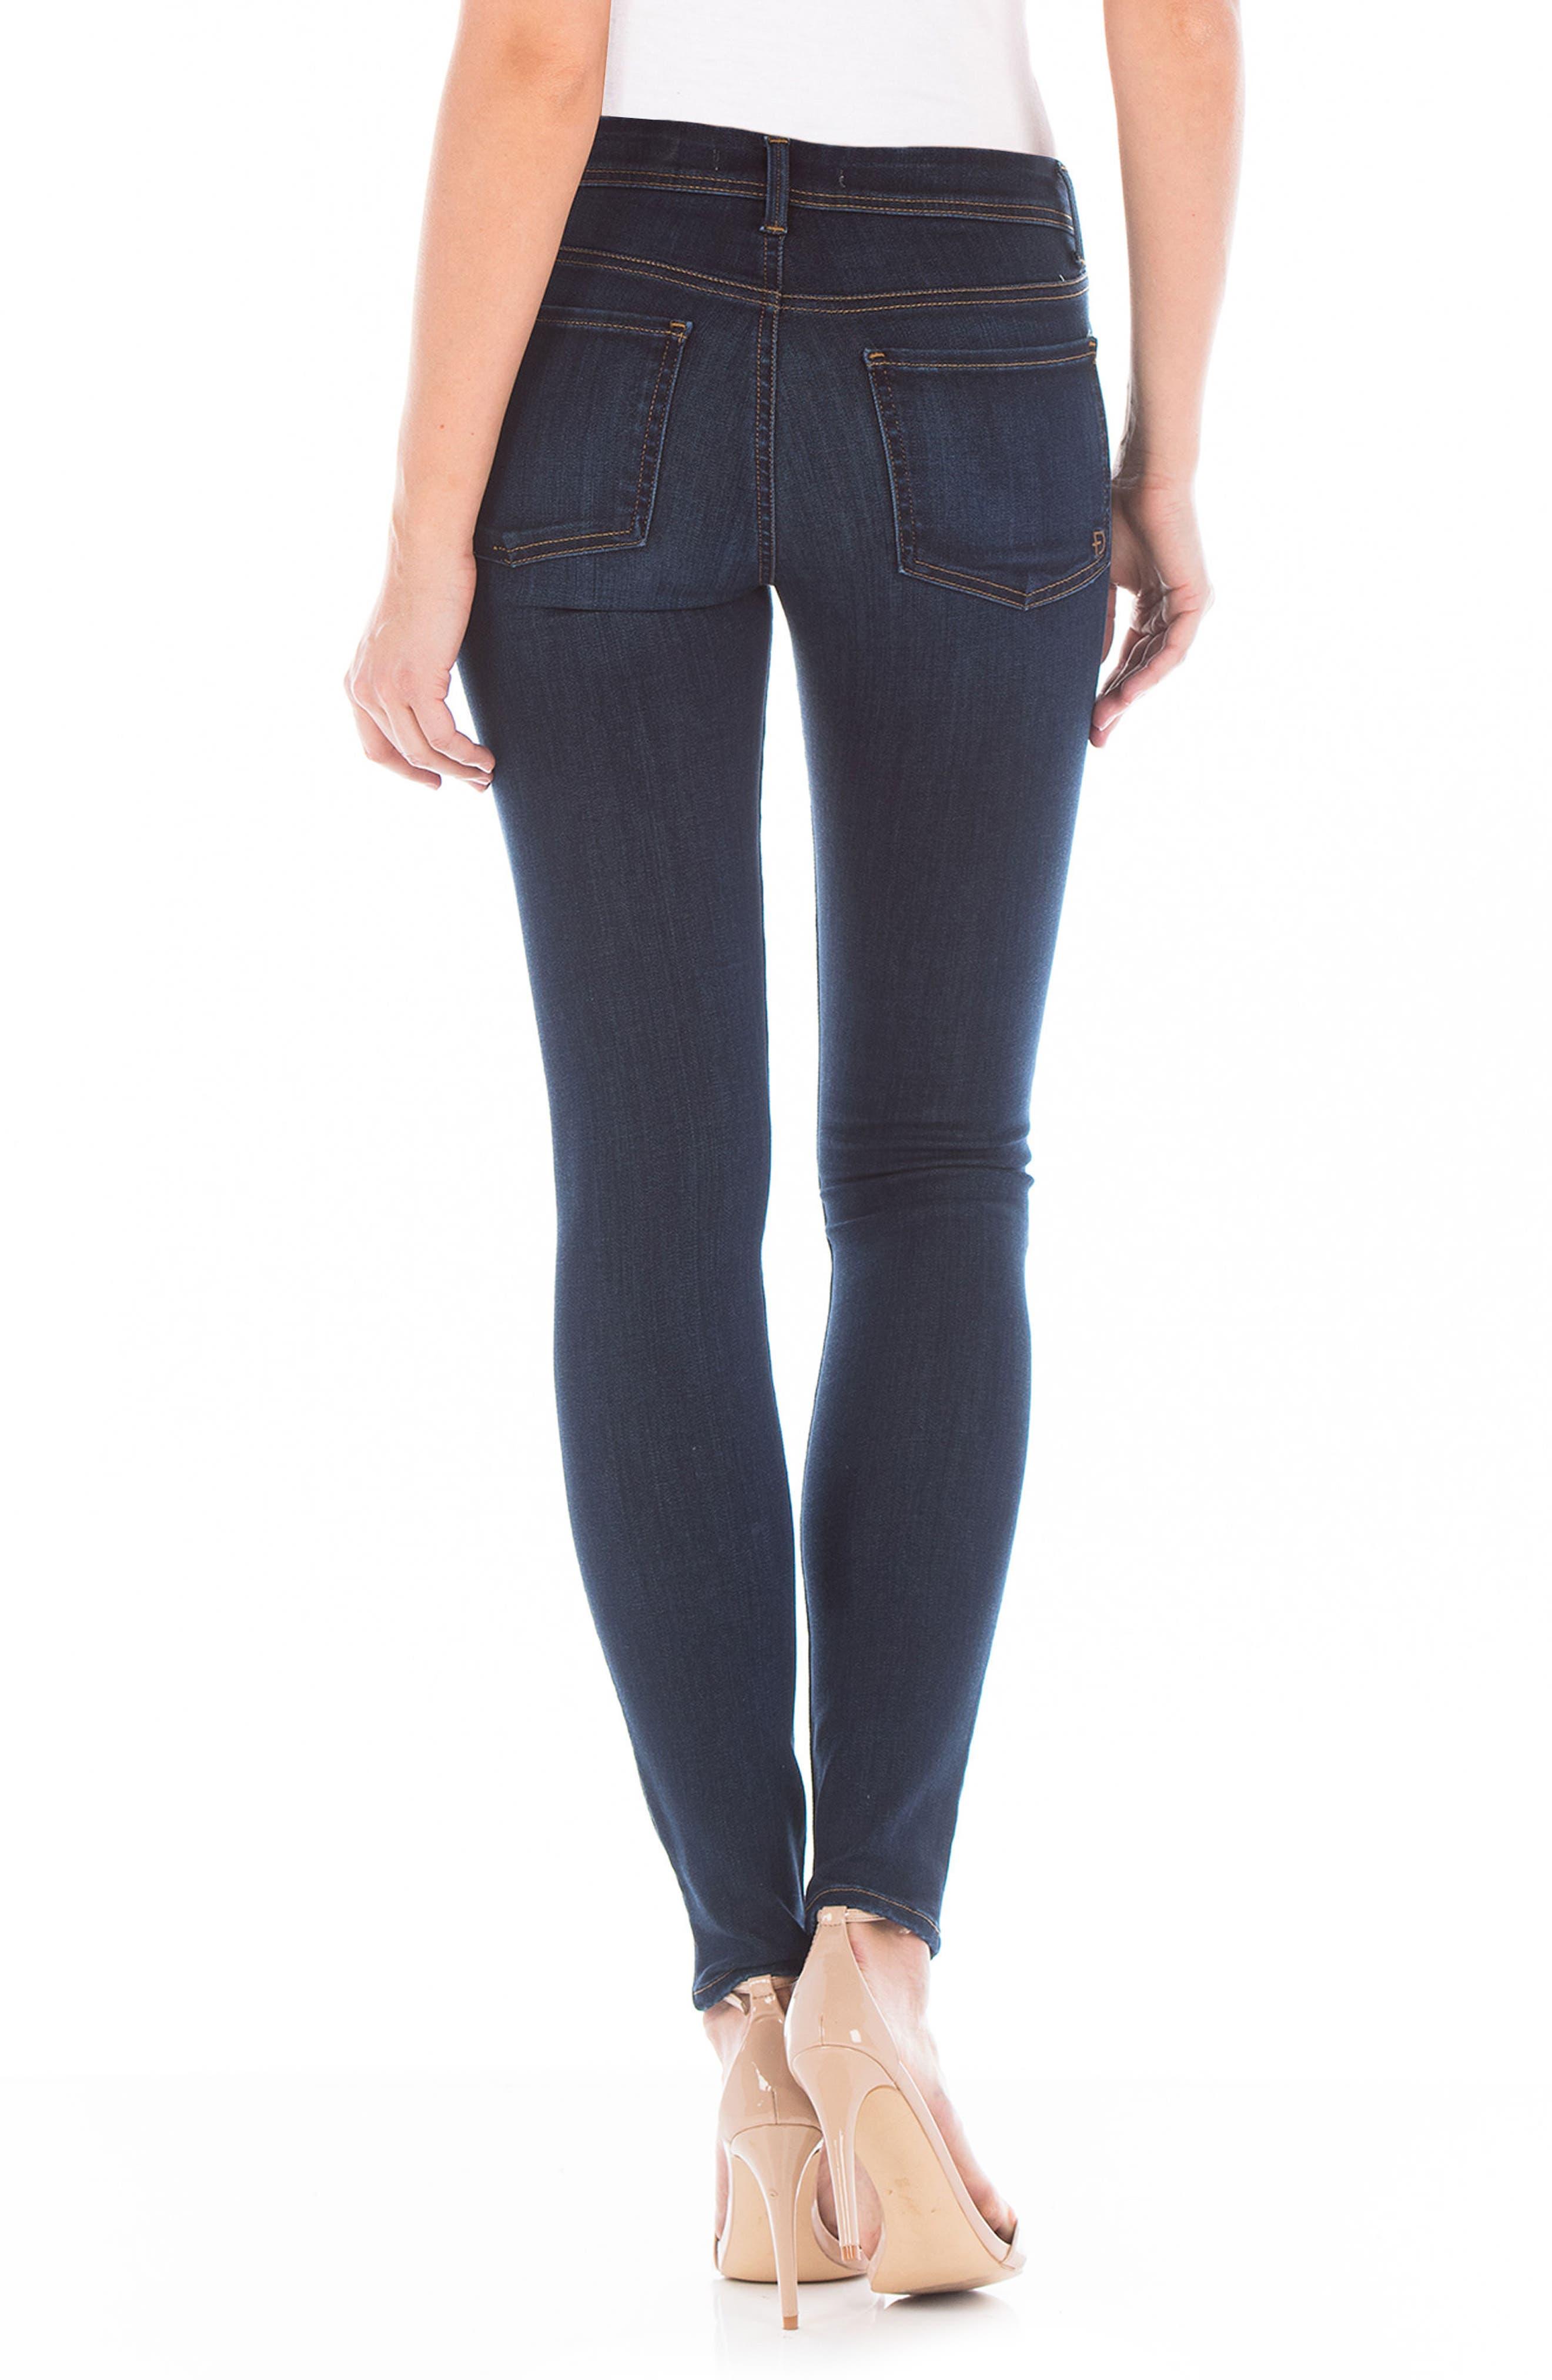 Belvedere Skinny Jeans,                             Alternate thumbnail 2, color,                             400